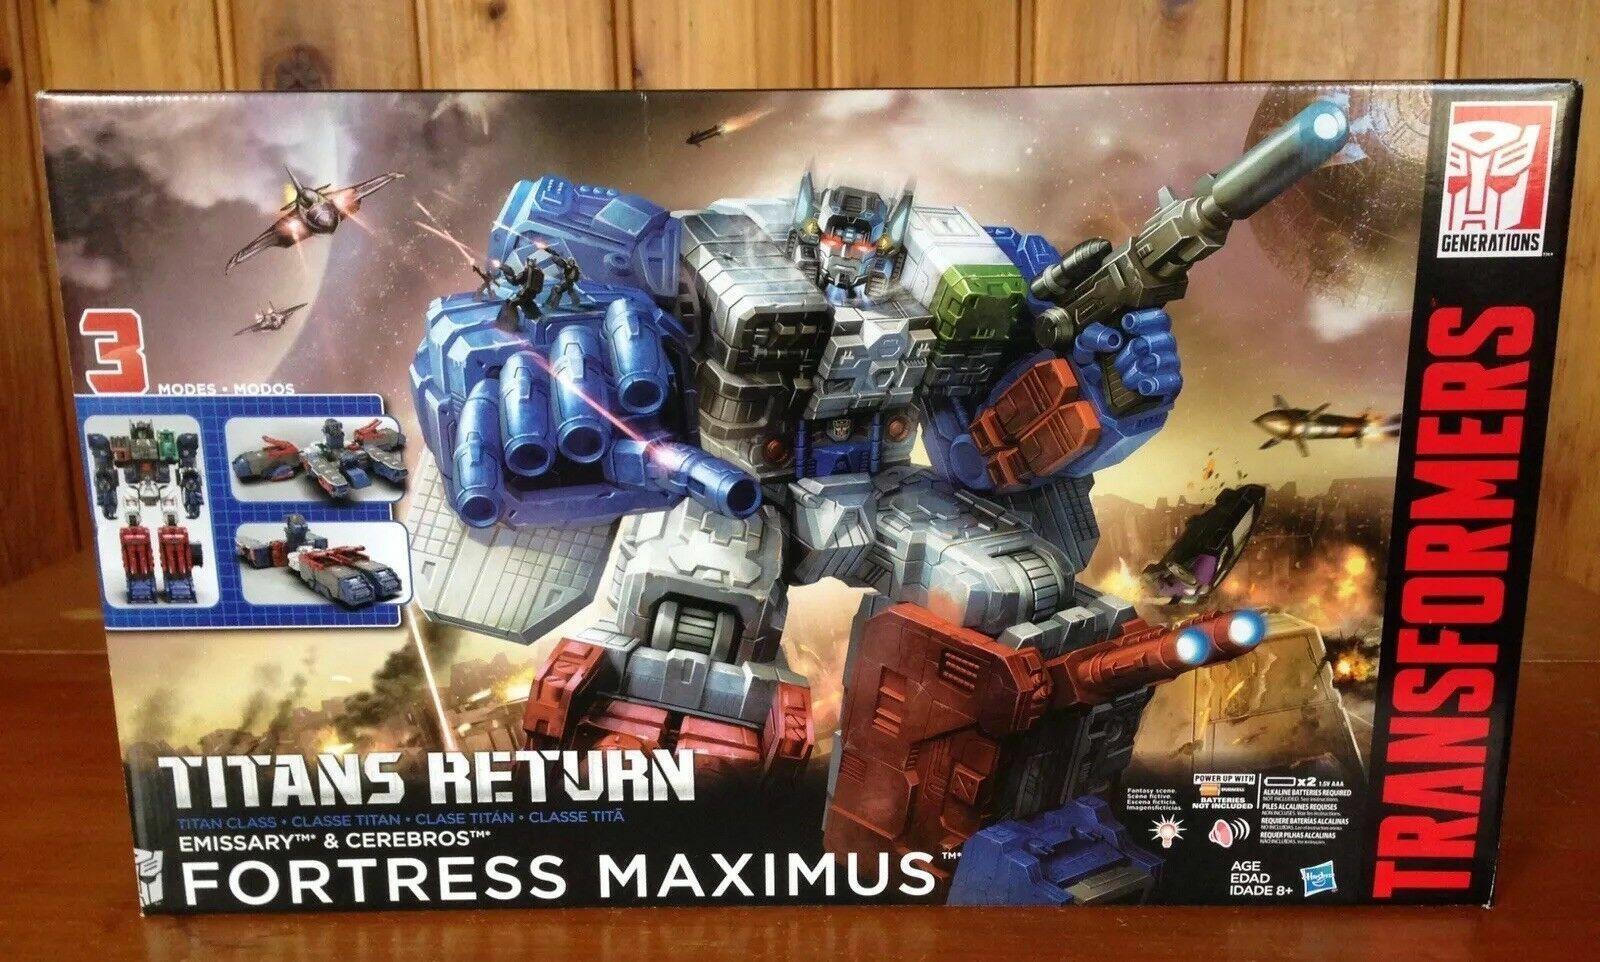 NEW Transformers Titans Return Titan Class Fortress Maximus, Emissary, Cerebros